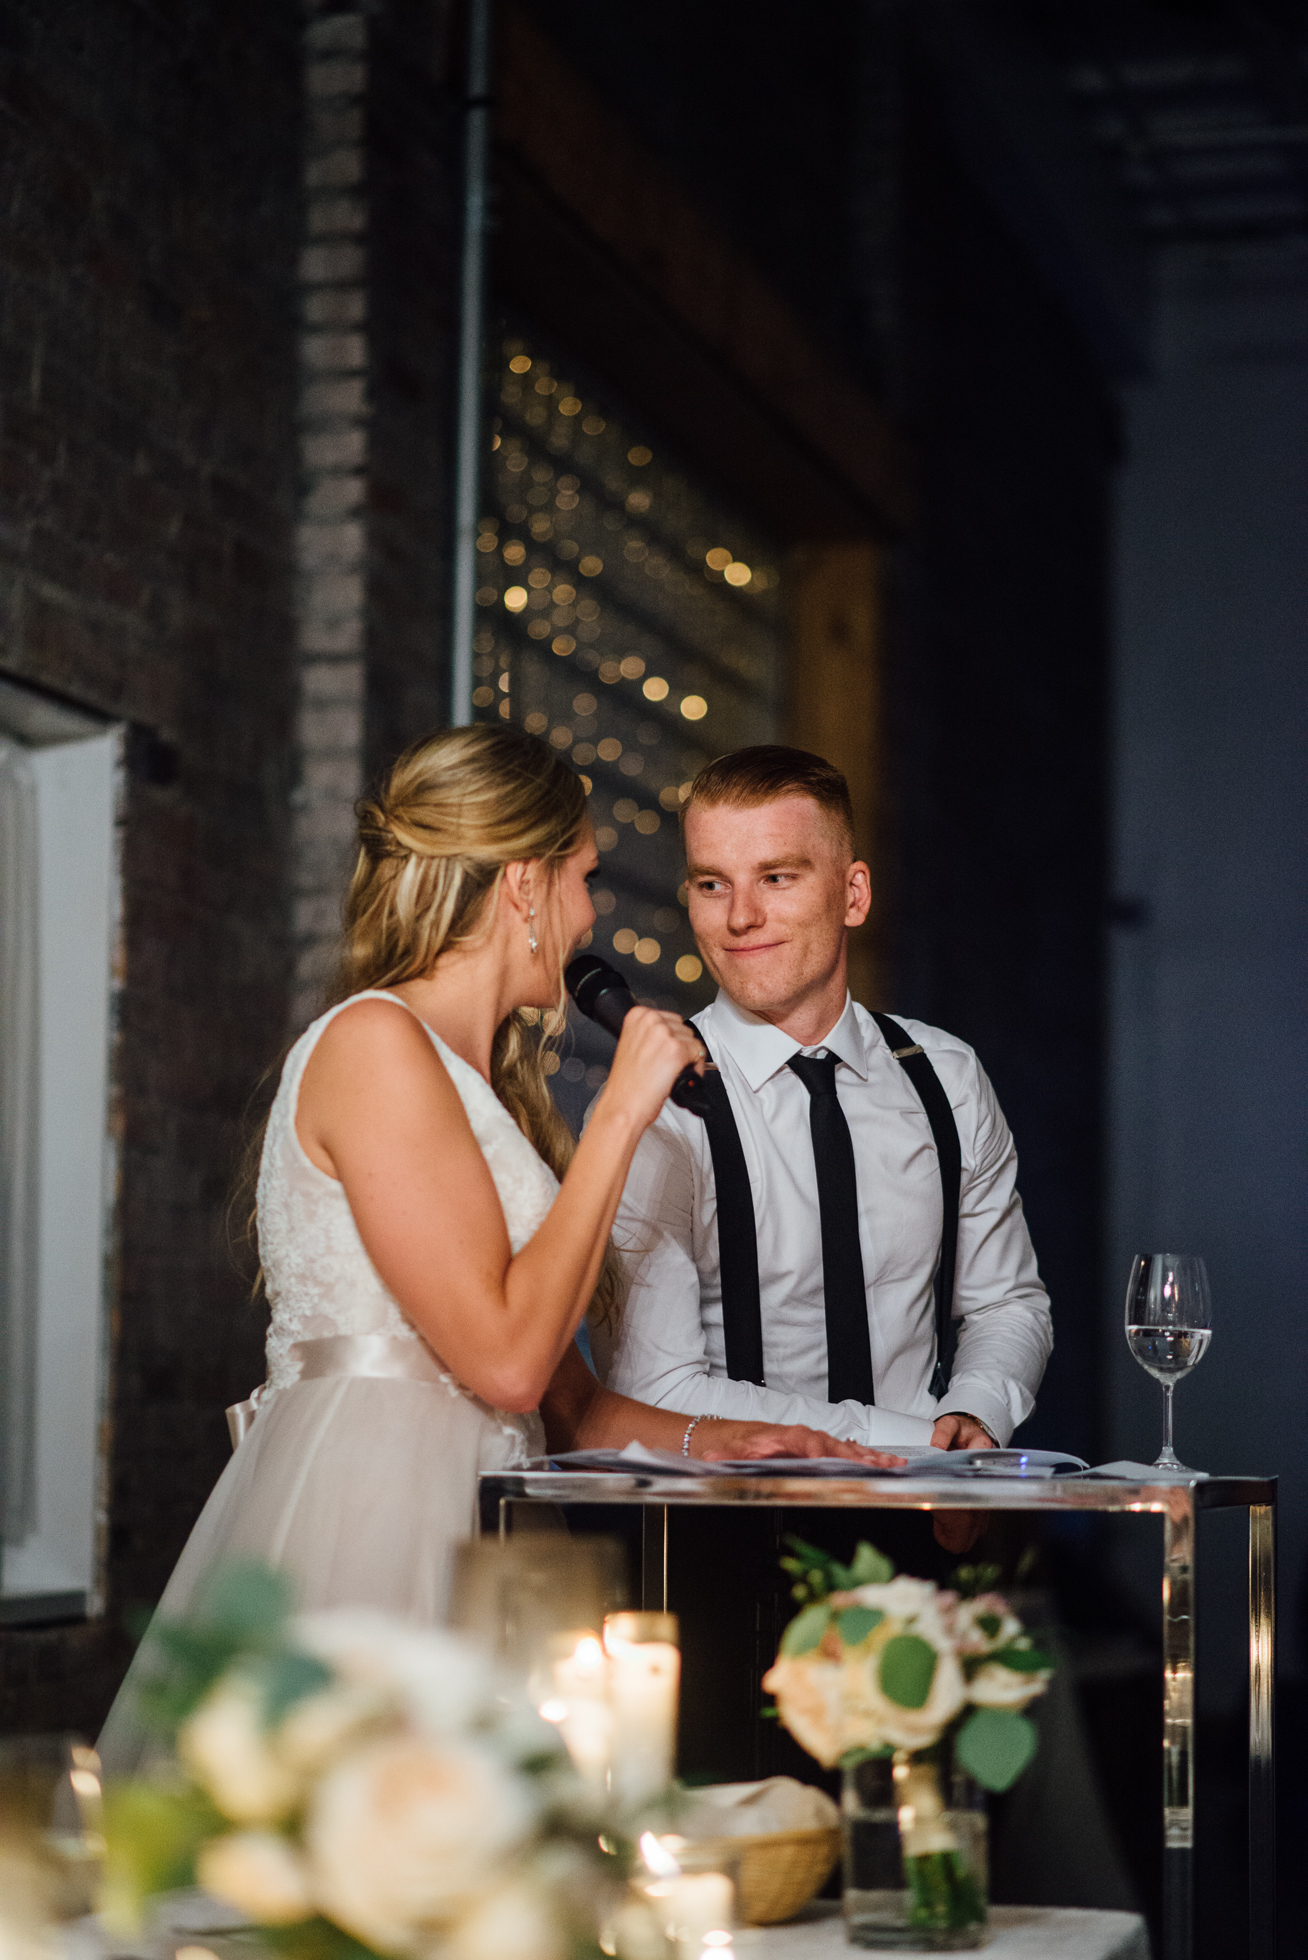 99-Sudbury-Toronto-Wedding-Photography-73.jpg